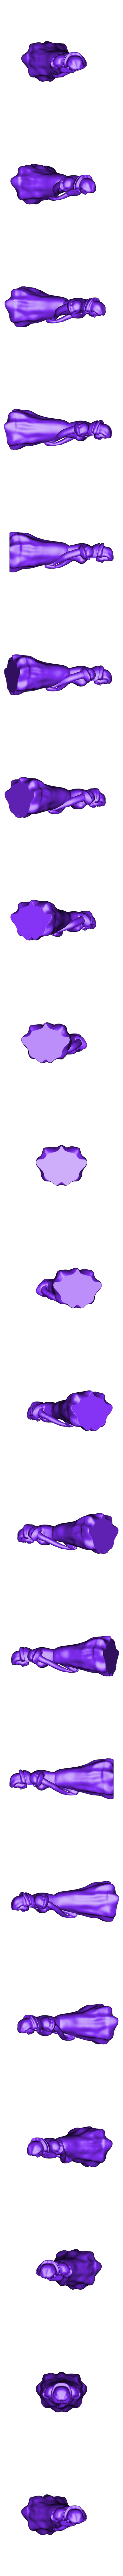 SnowWhite-1.stl Download free STL file Dwarfs - Snow White Remixed • 3D printing model, quangdo1700